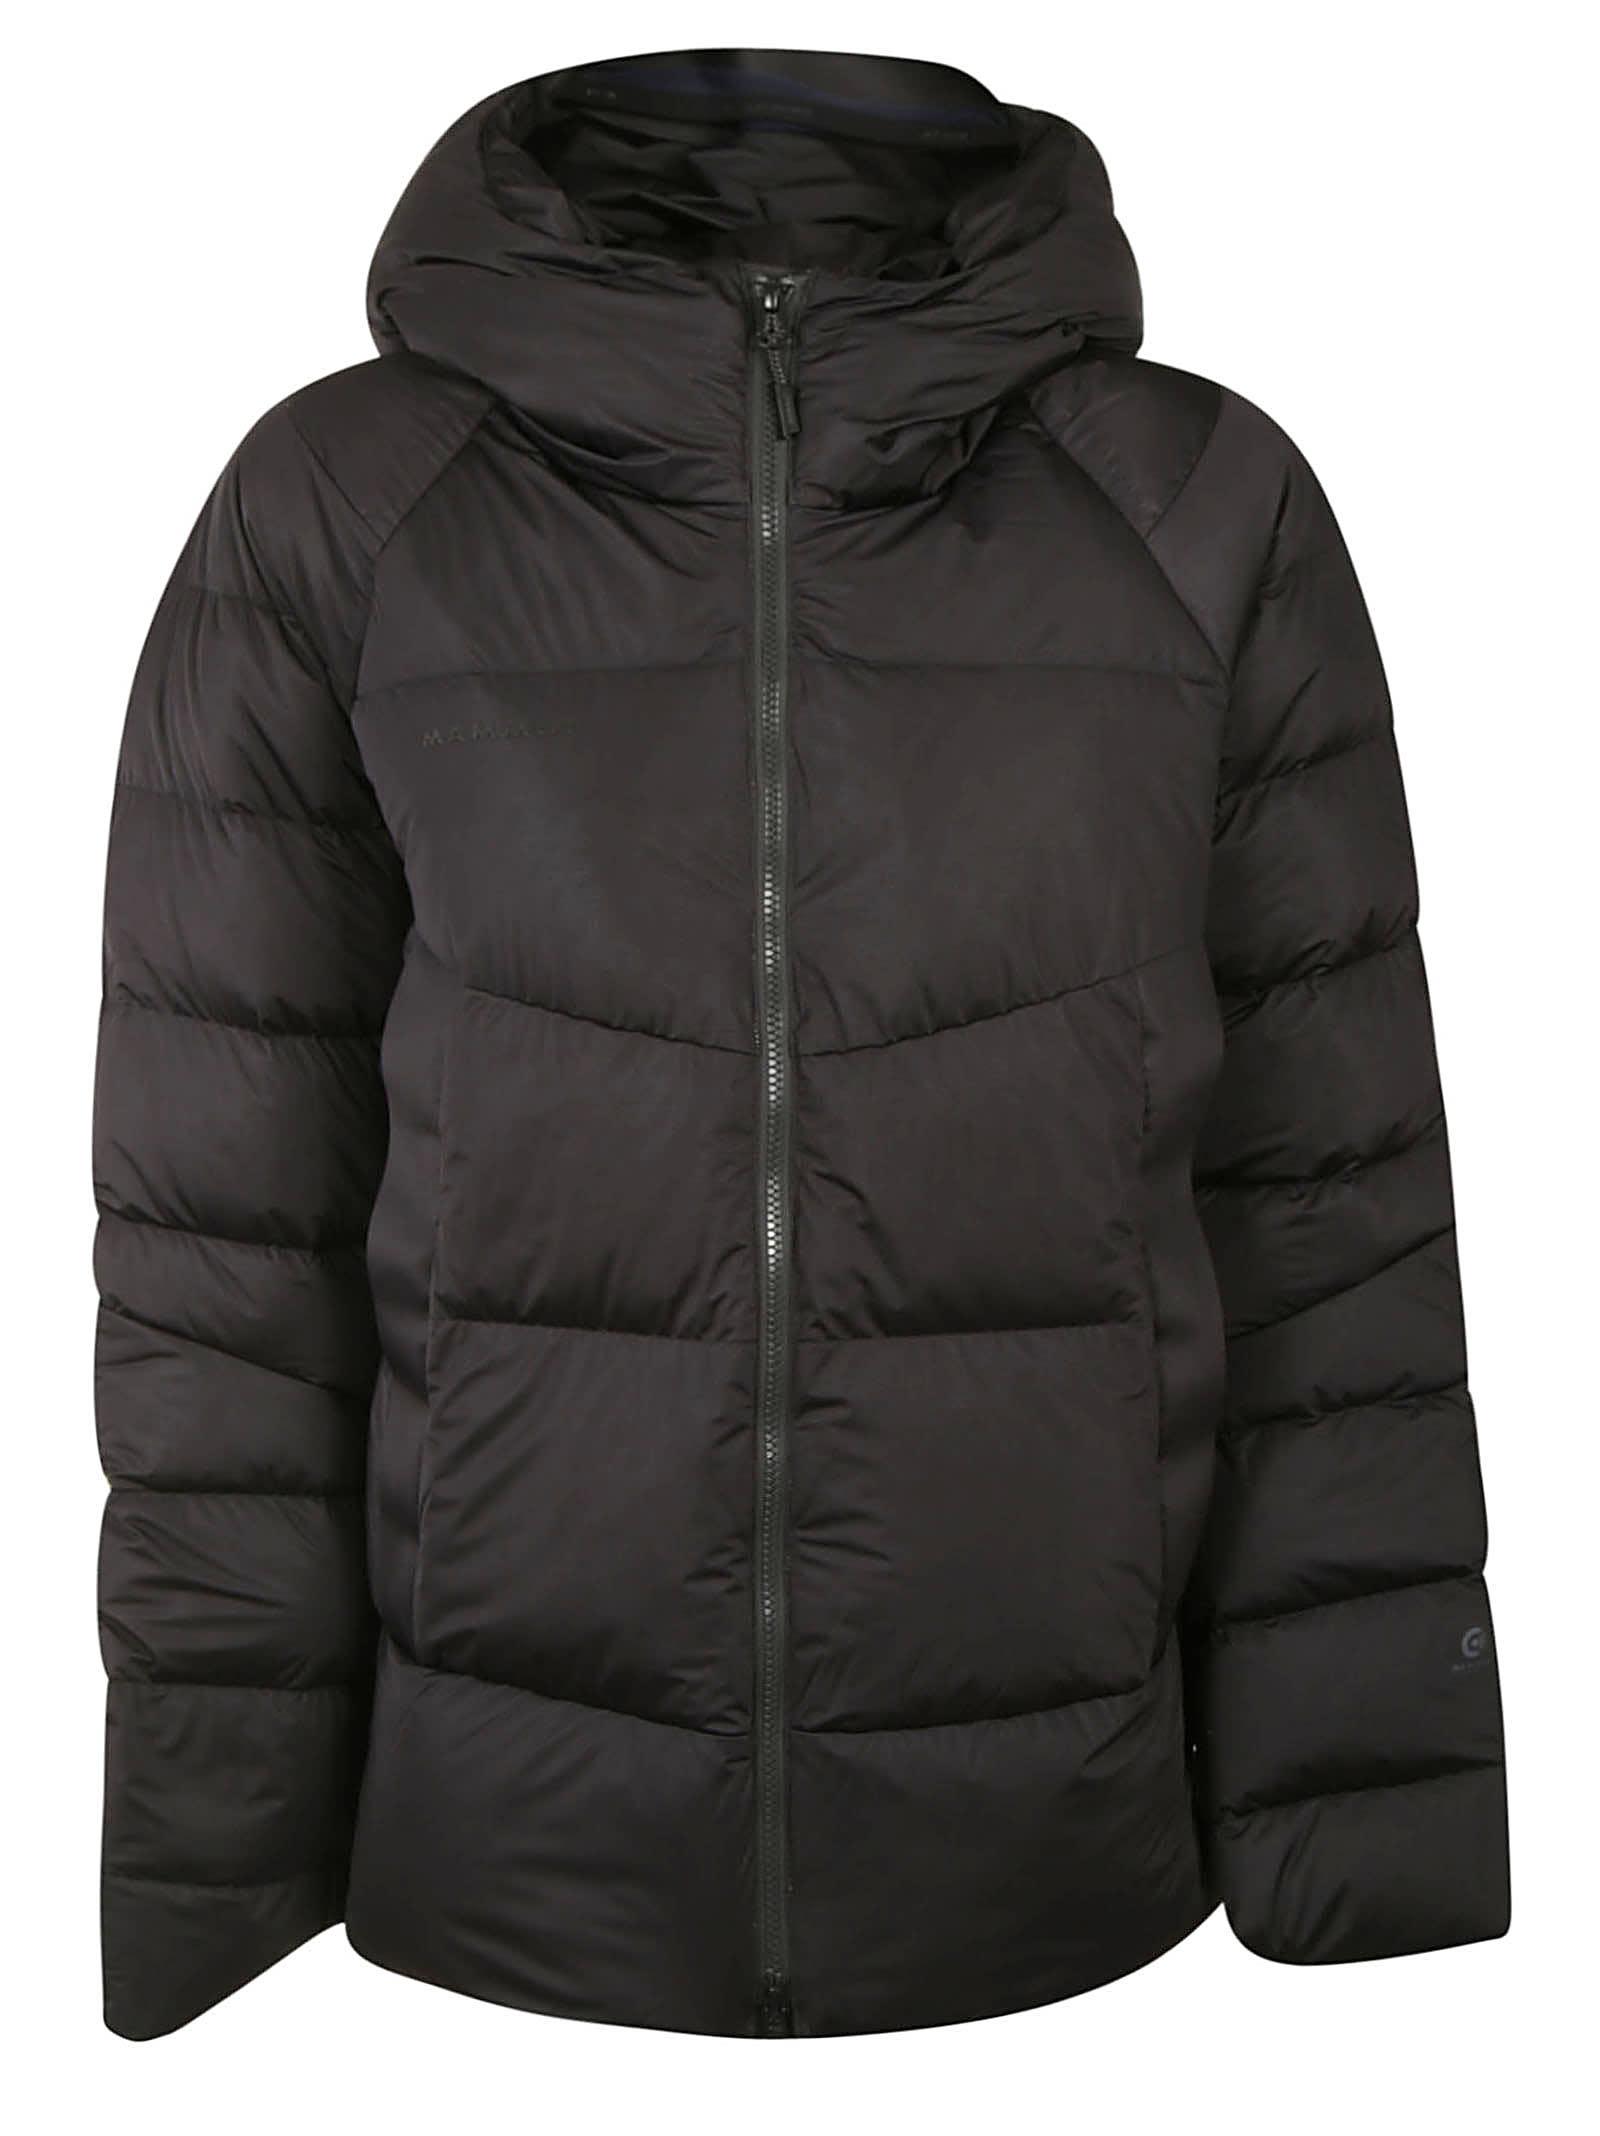 Photo of  Mammut Zun In Hooded Padded Jacket- shop Mammut jackets online sales